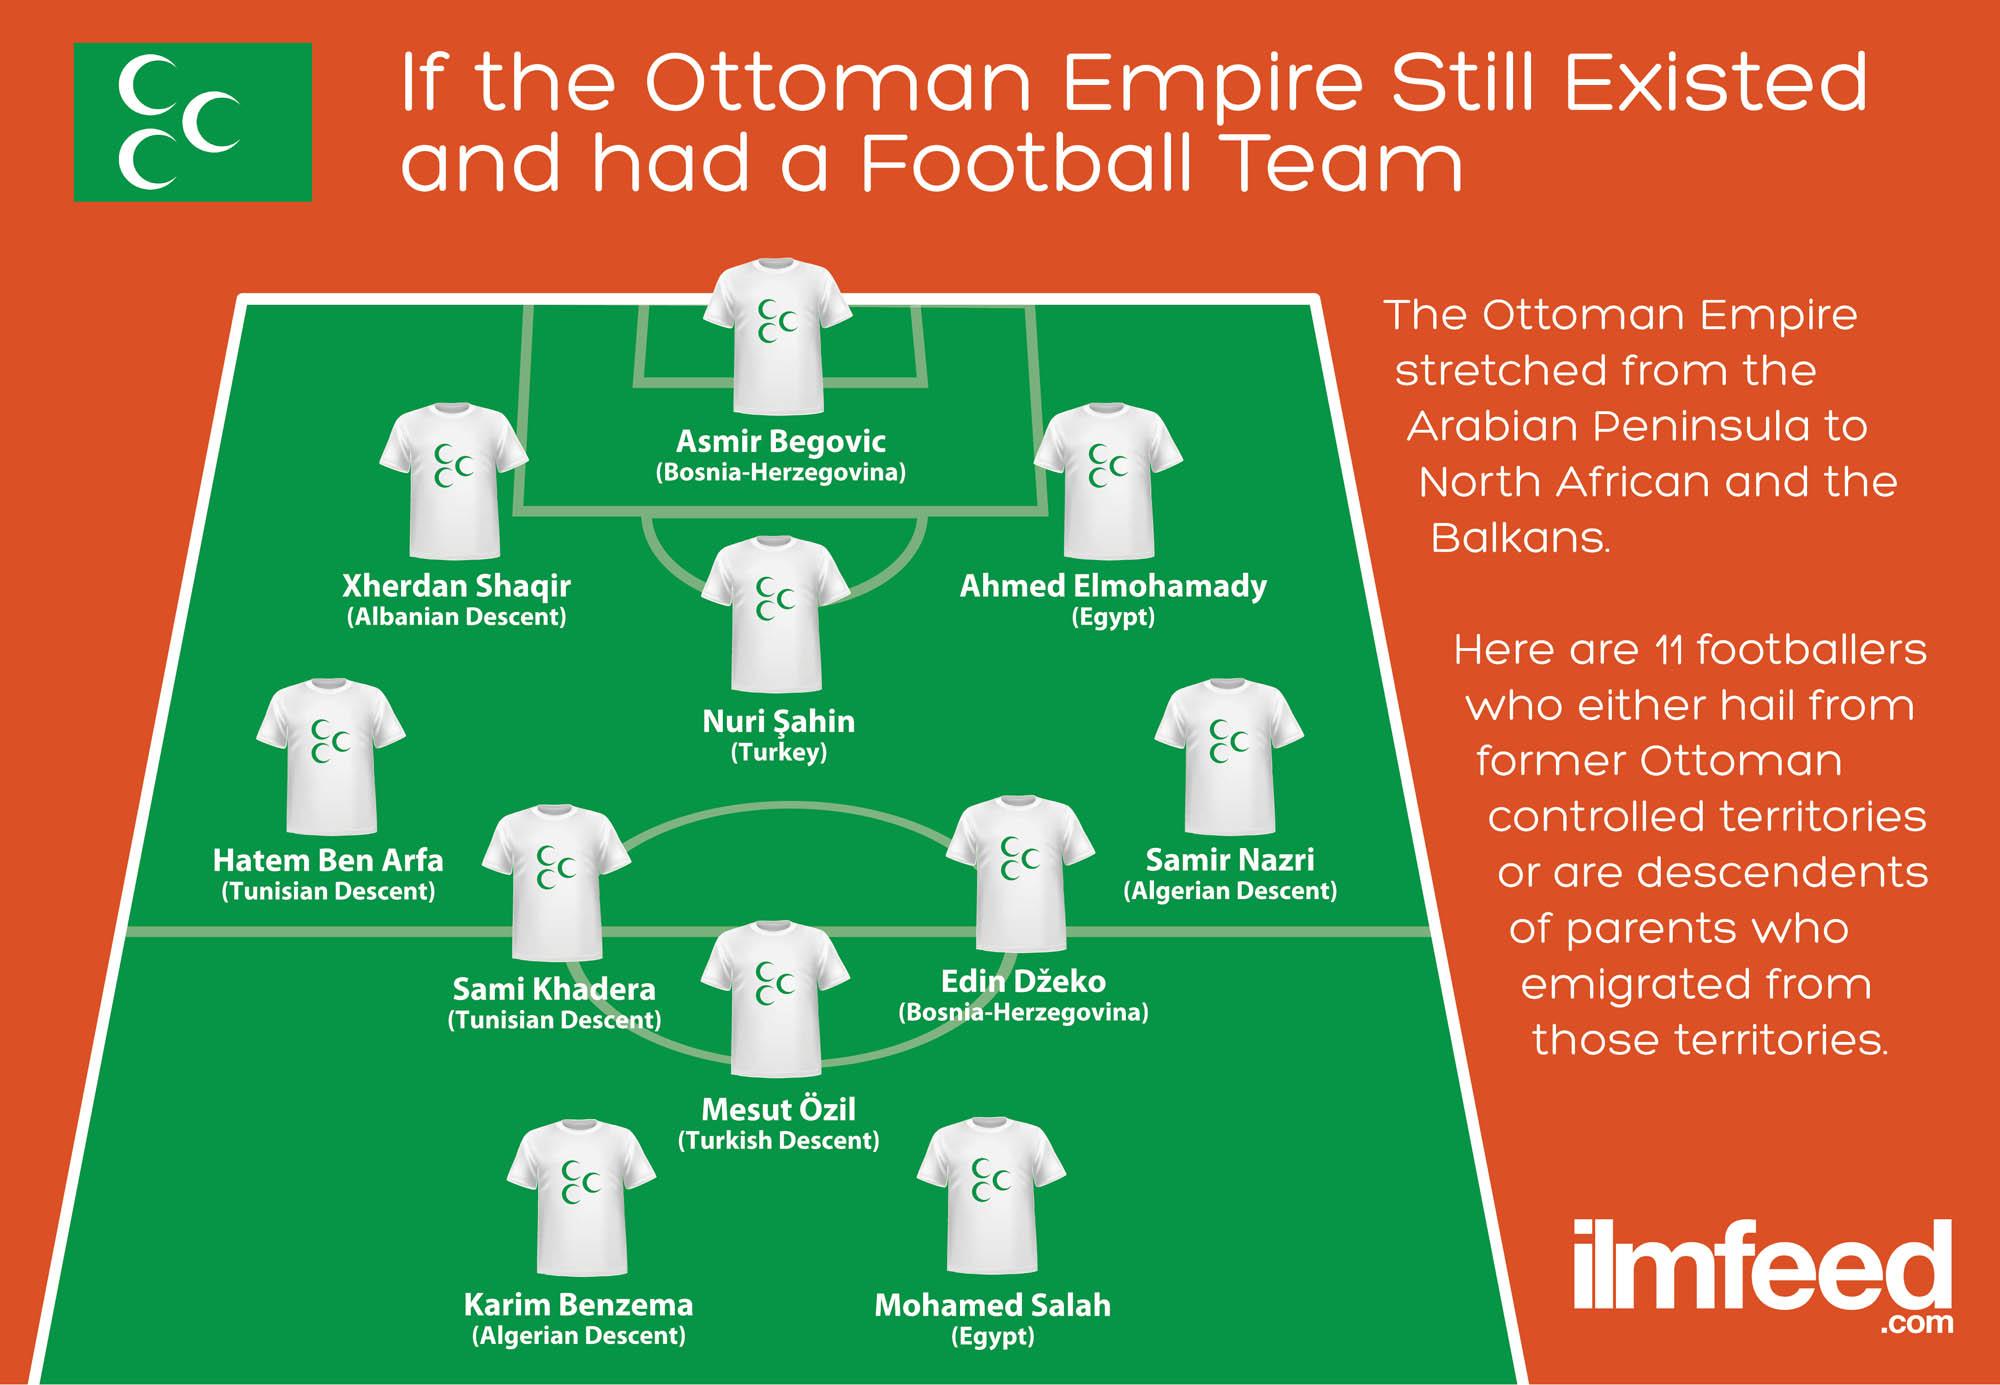 Ottoman Team